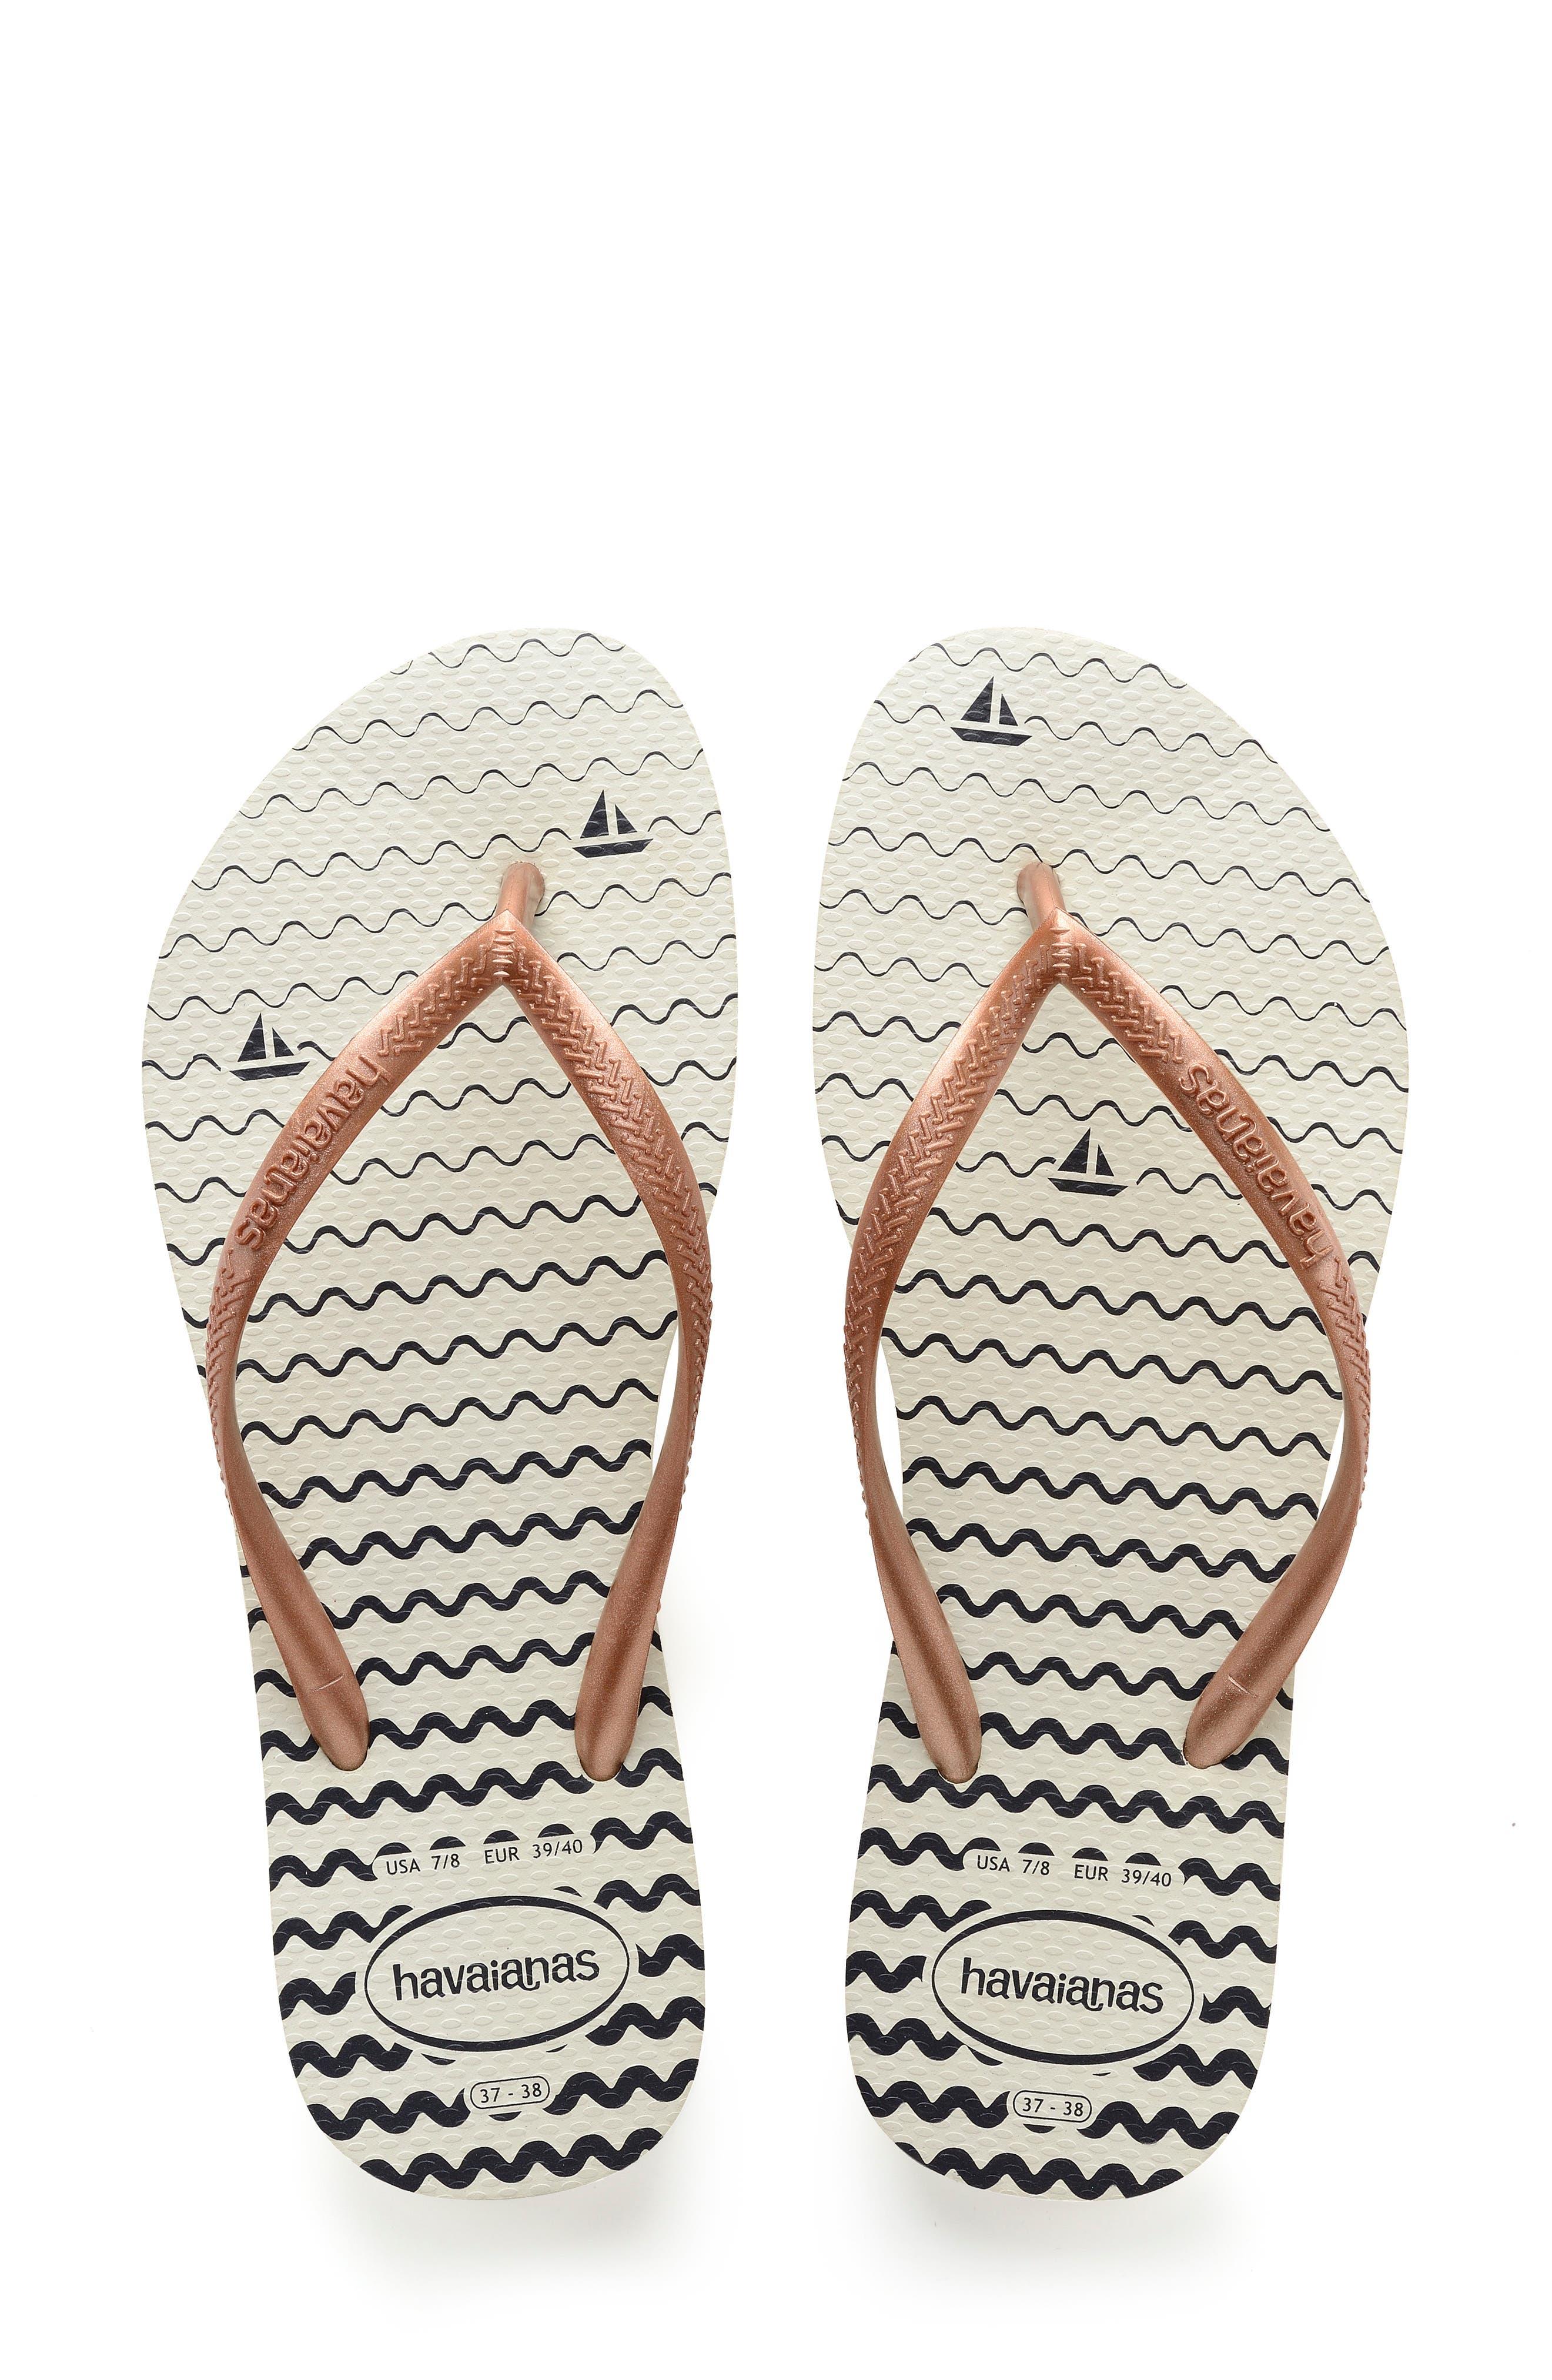 HAVAIANAS, Slim Oceano Flip Flop, Main thumbnail 1, color, WHITE